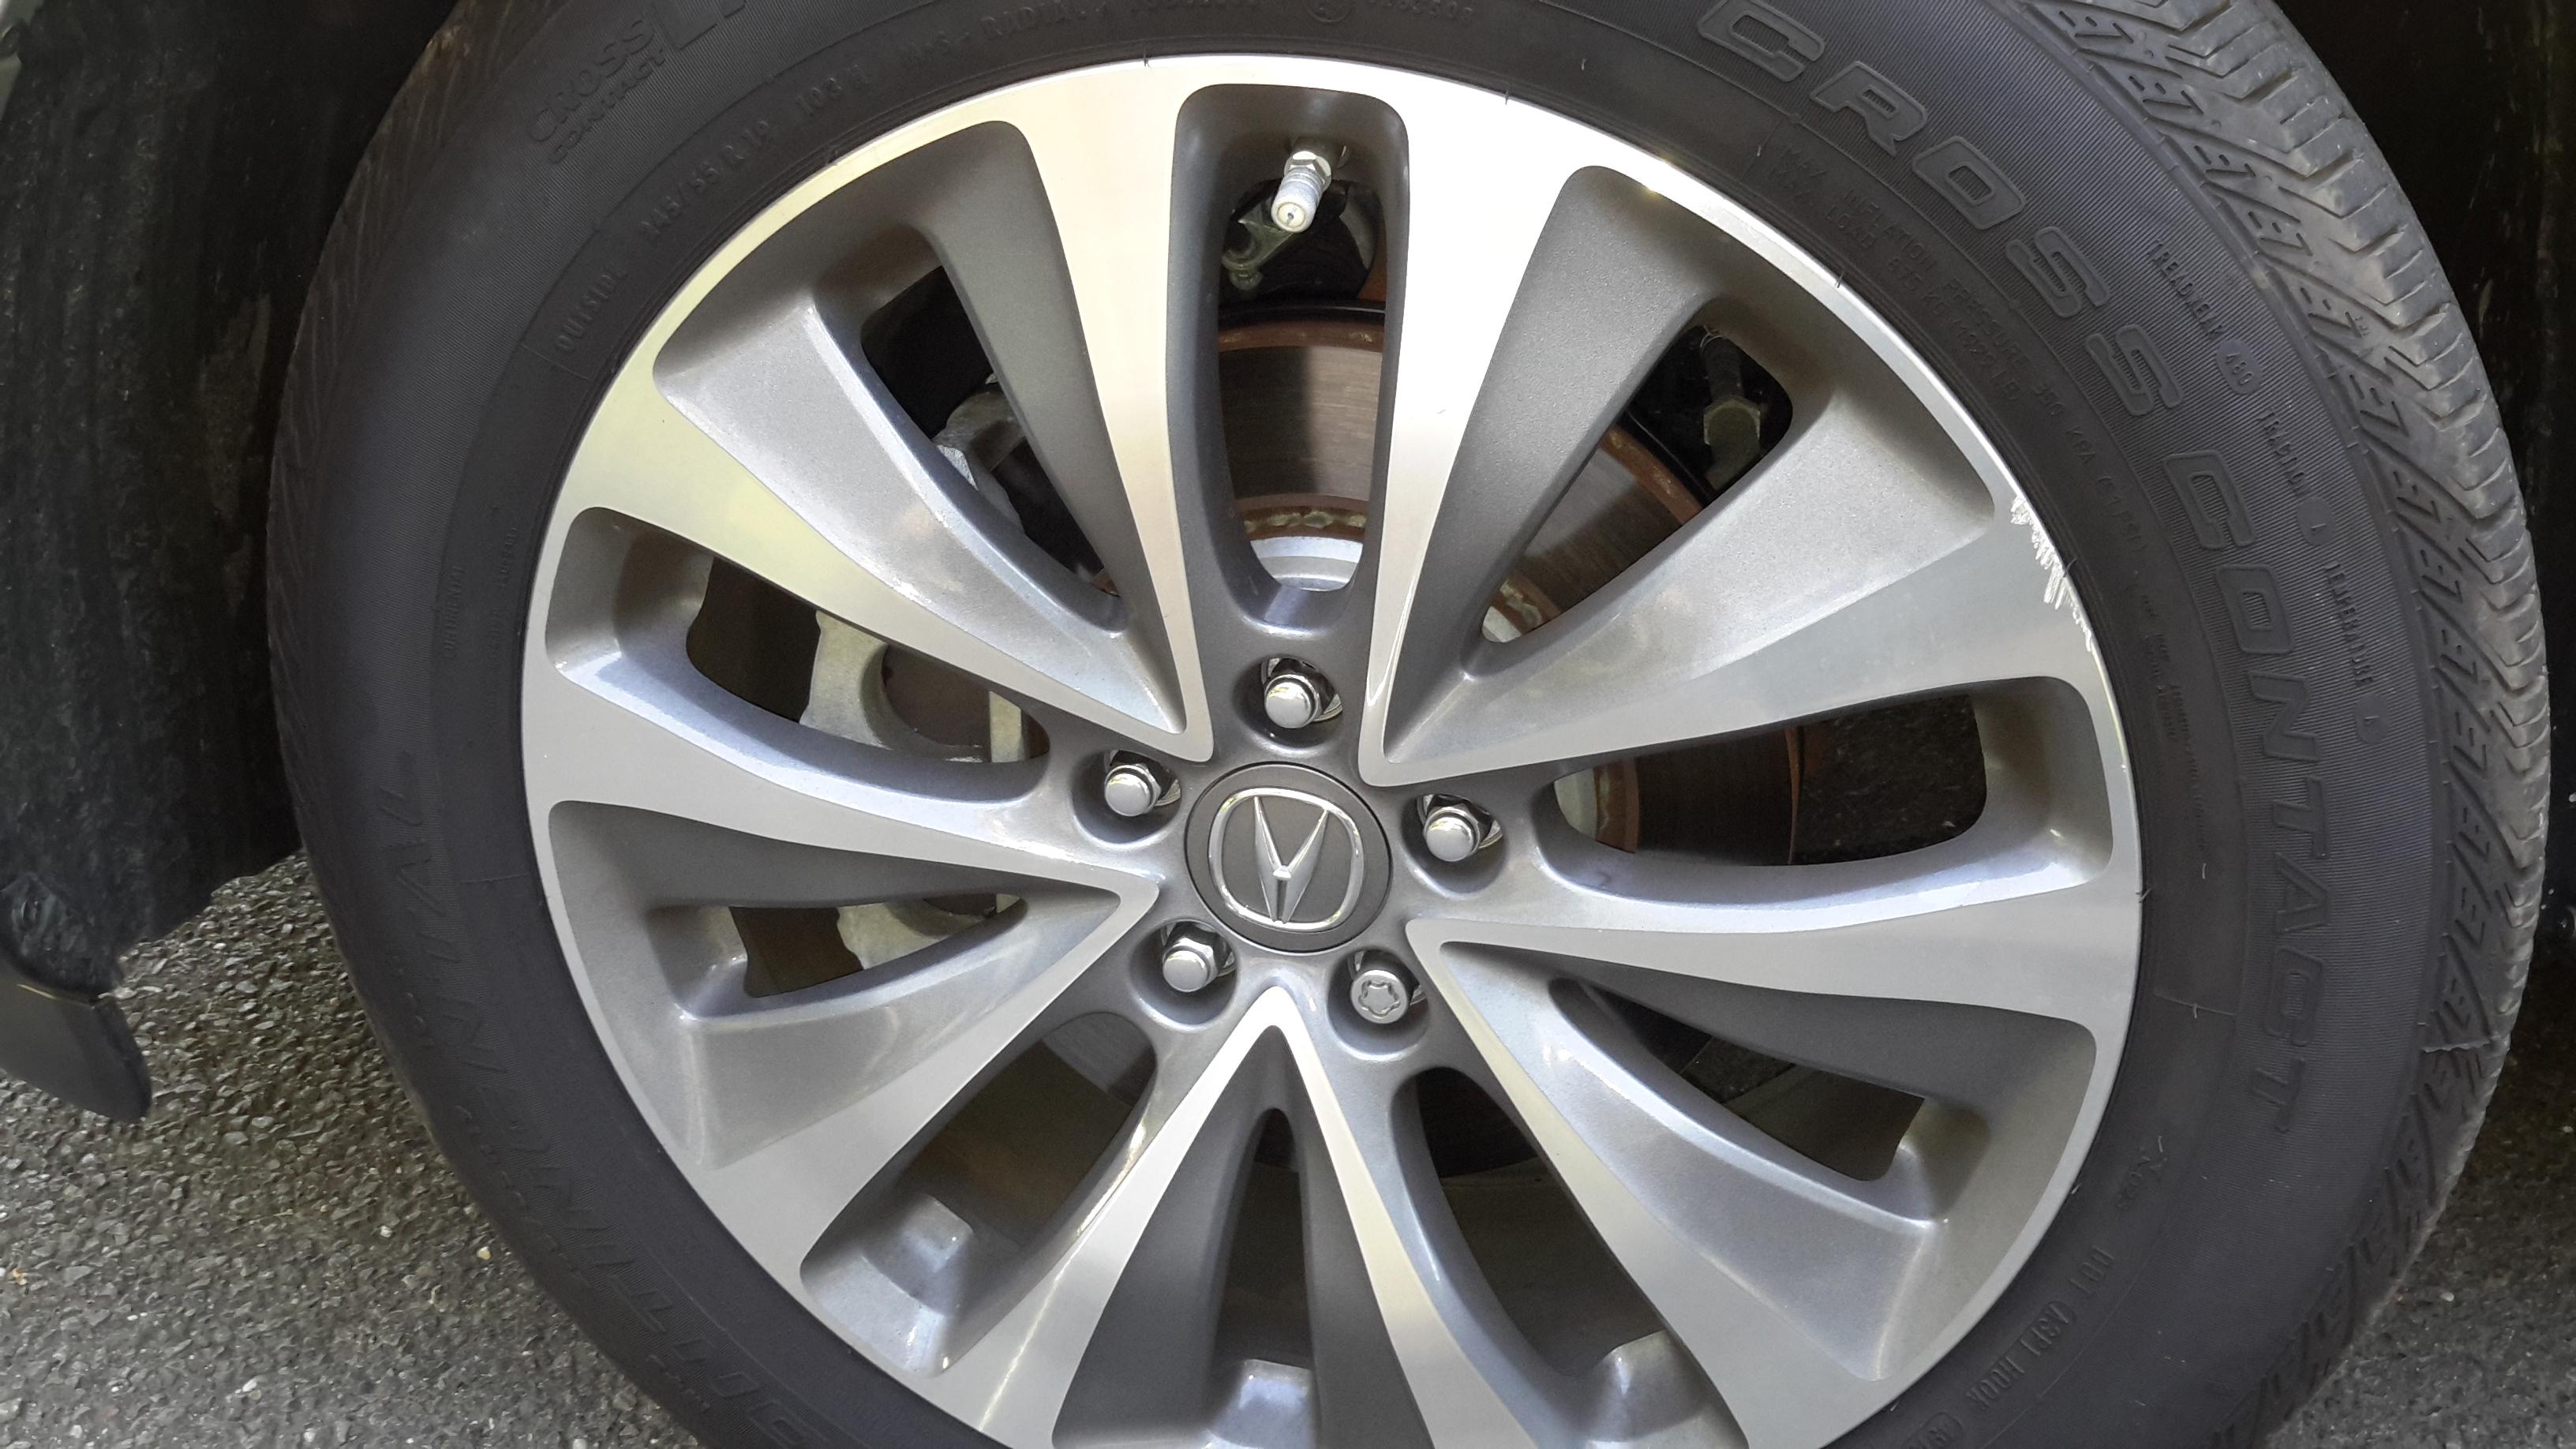 2014 mdx tech deep scratches in rim Acura MDX Forum Acura MDX